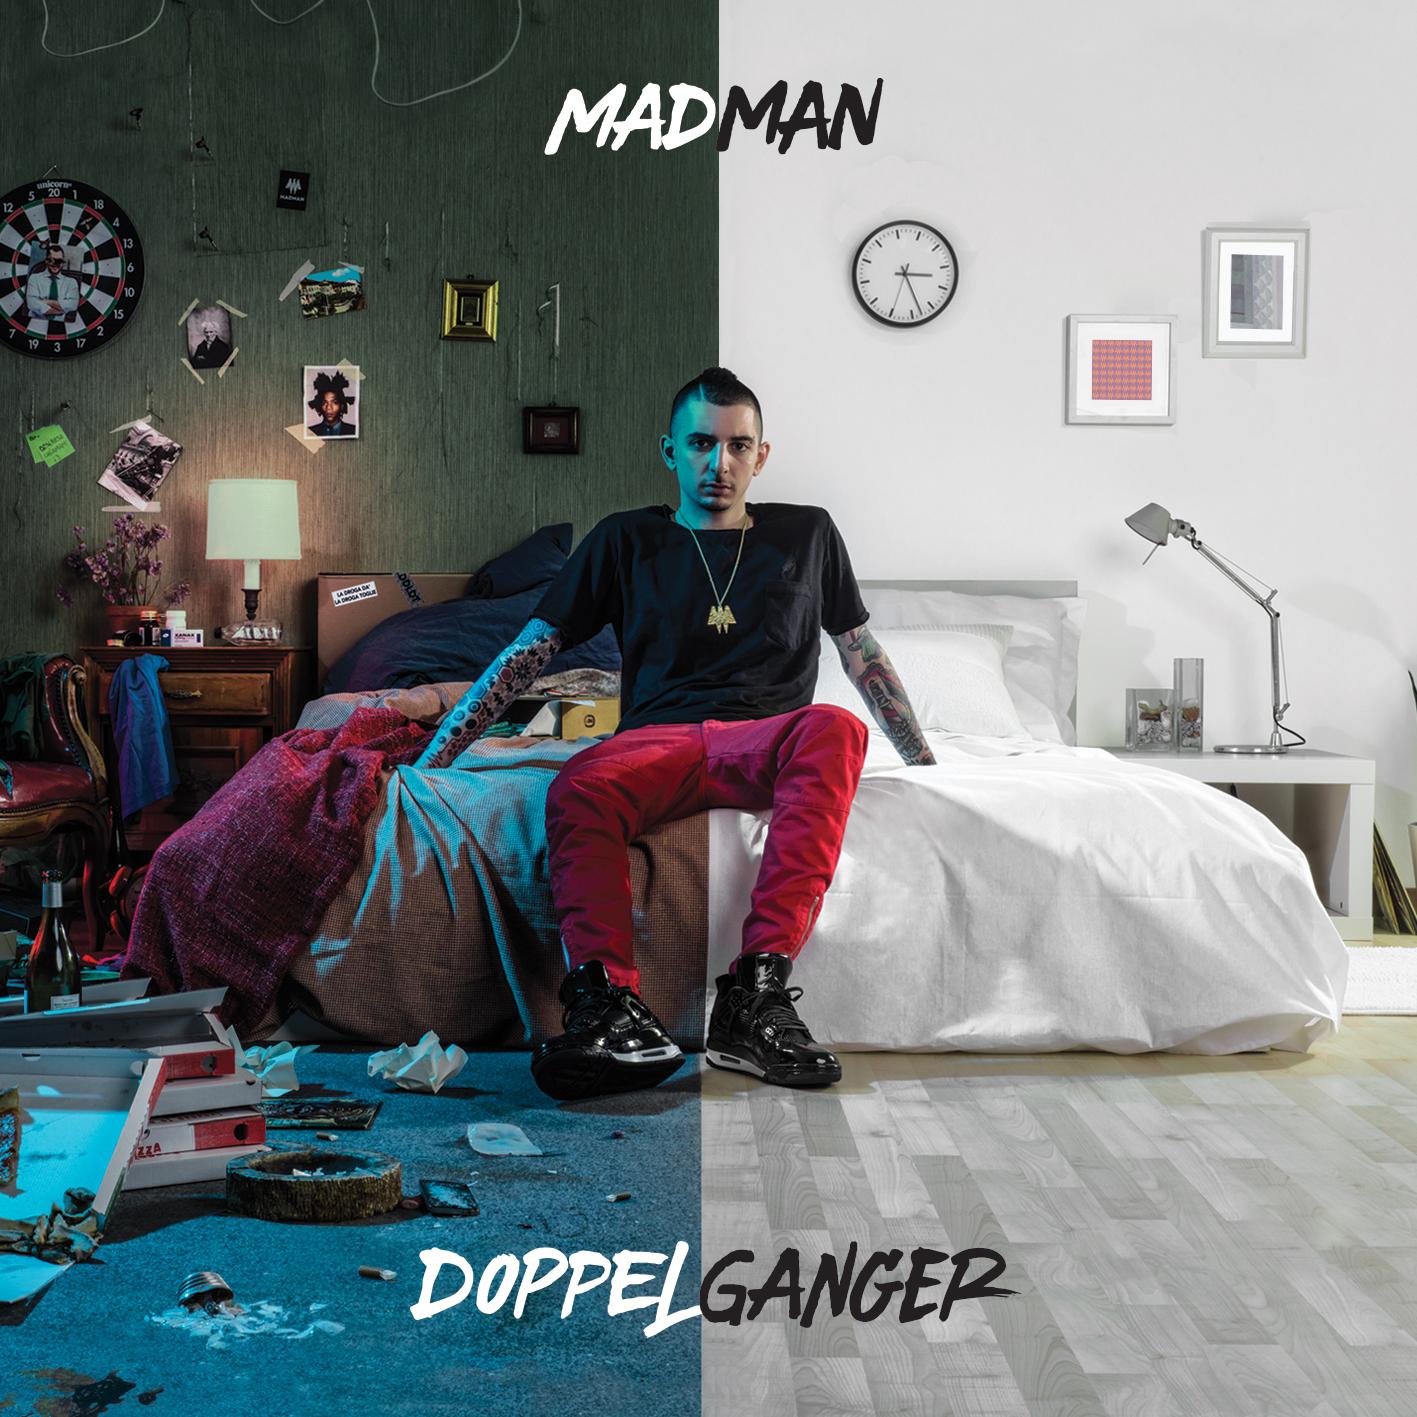 copertina definitiva madman doppelganger